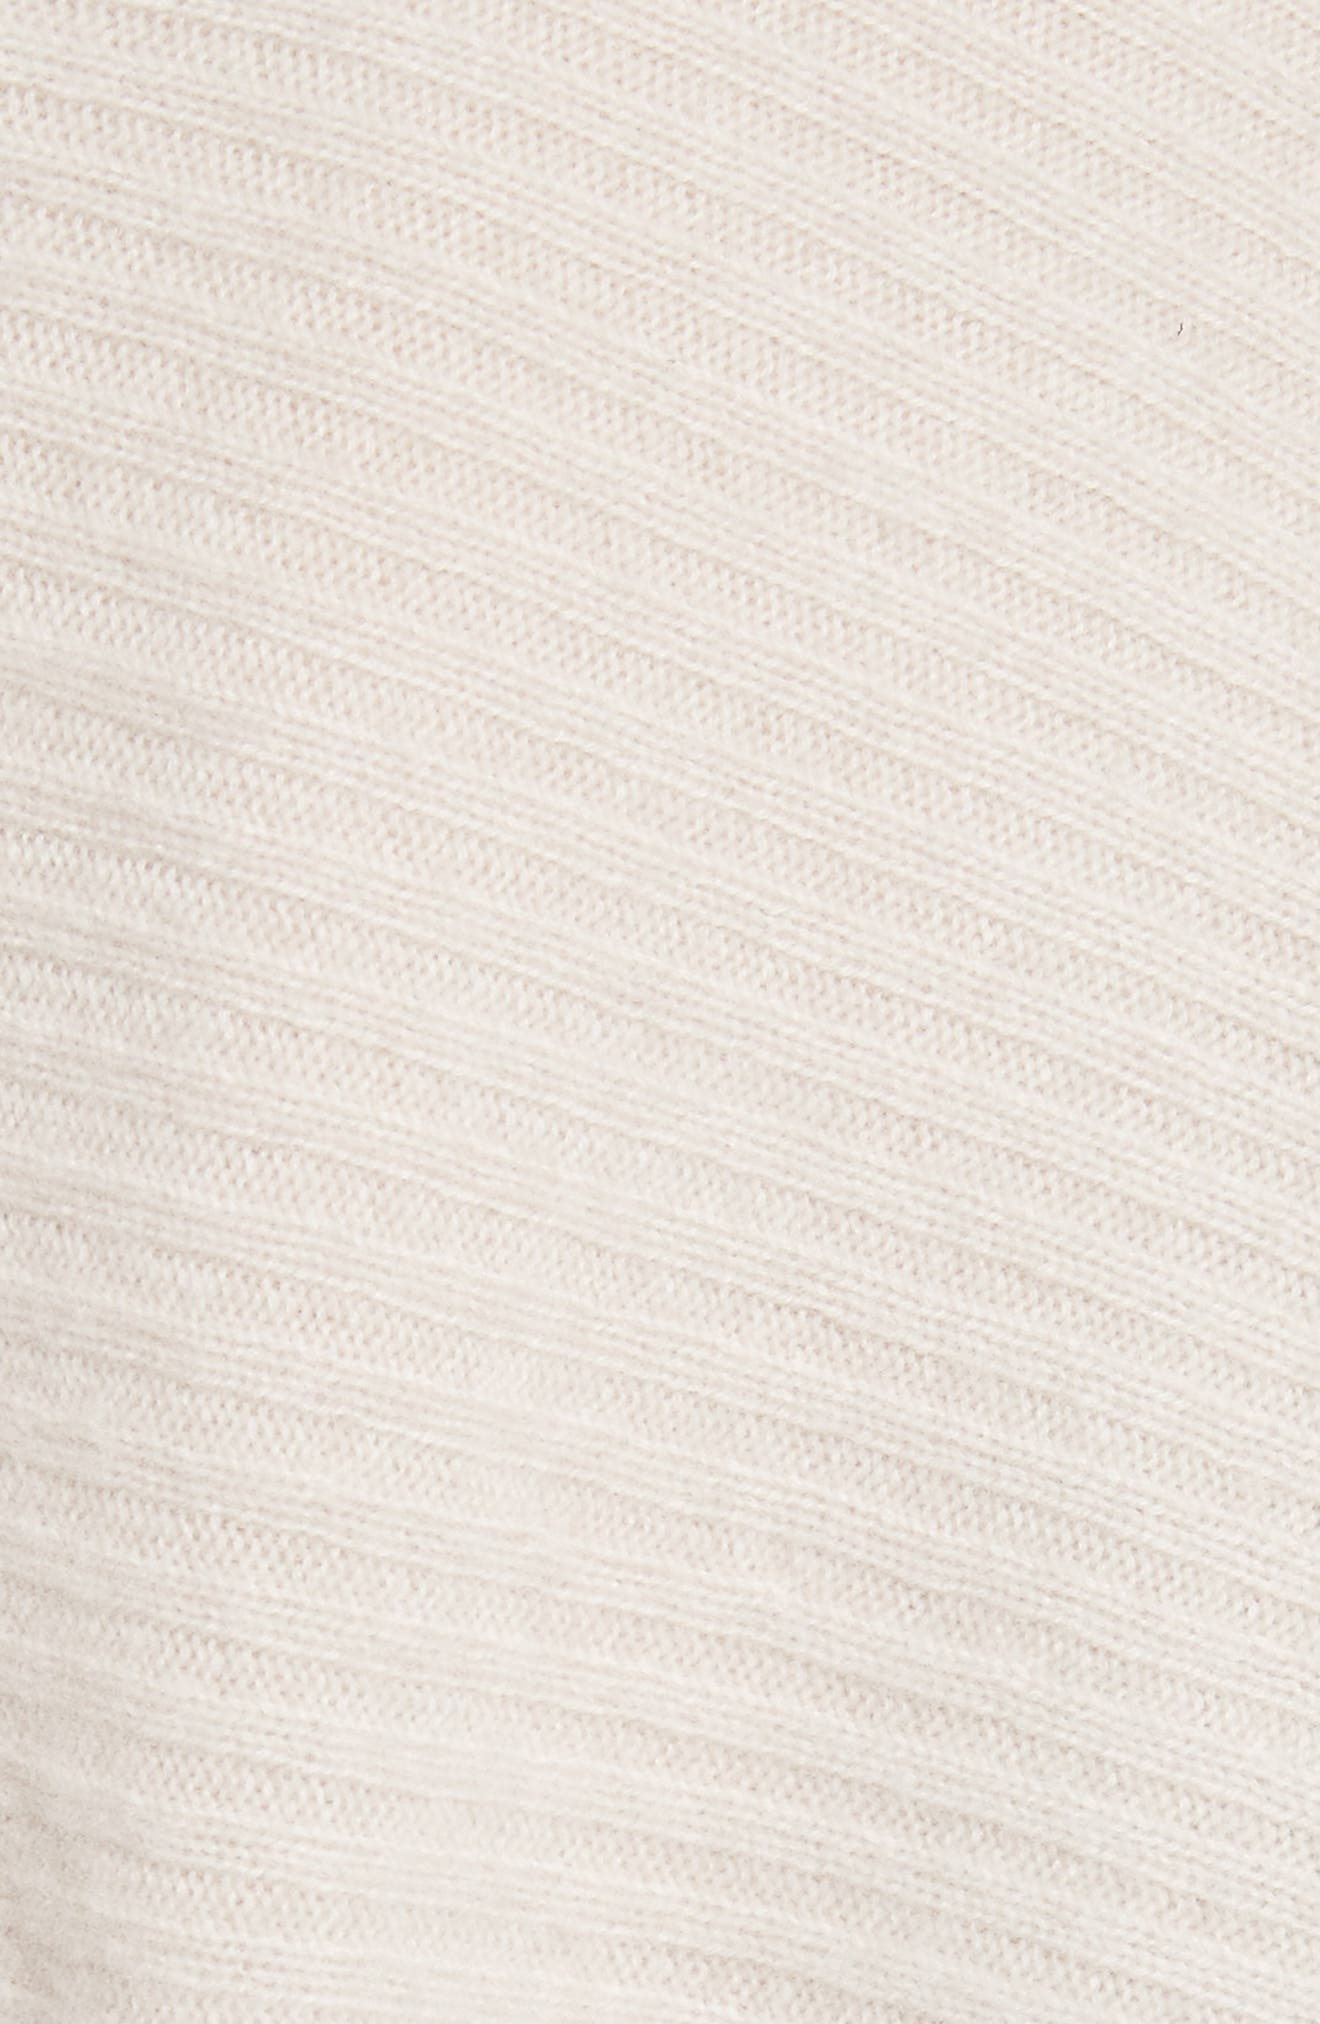 Wool Blend Raglan V-Neck Sweater,                             Alternate thumbnail 5, color,                             Chalet